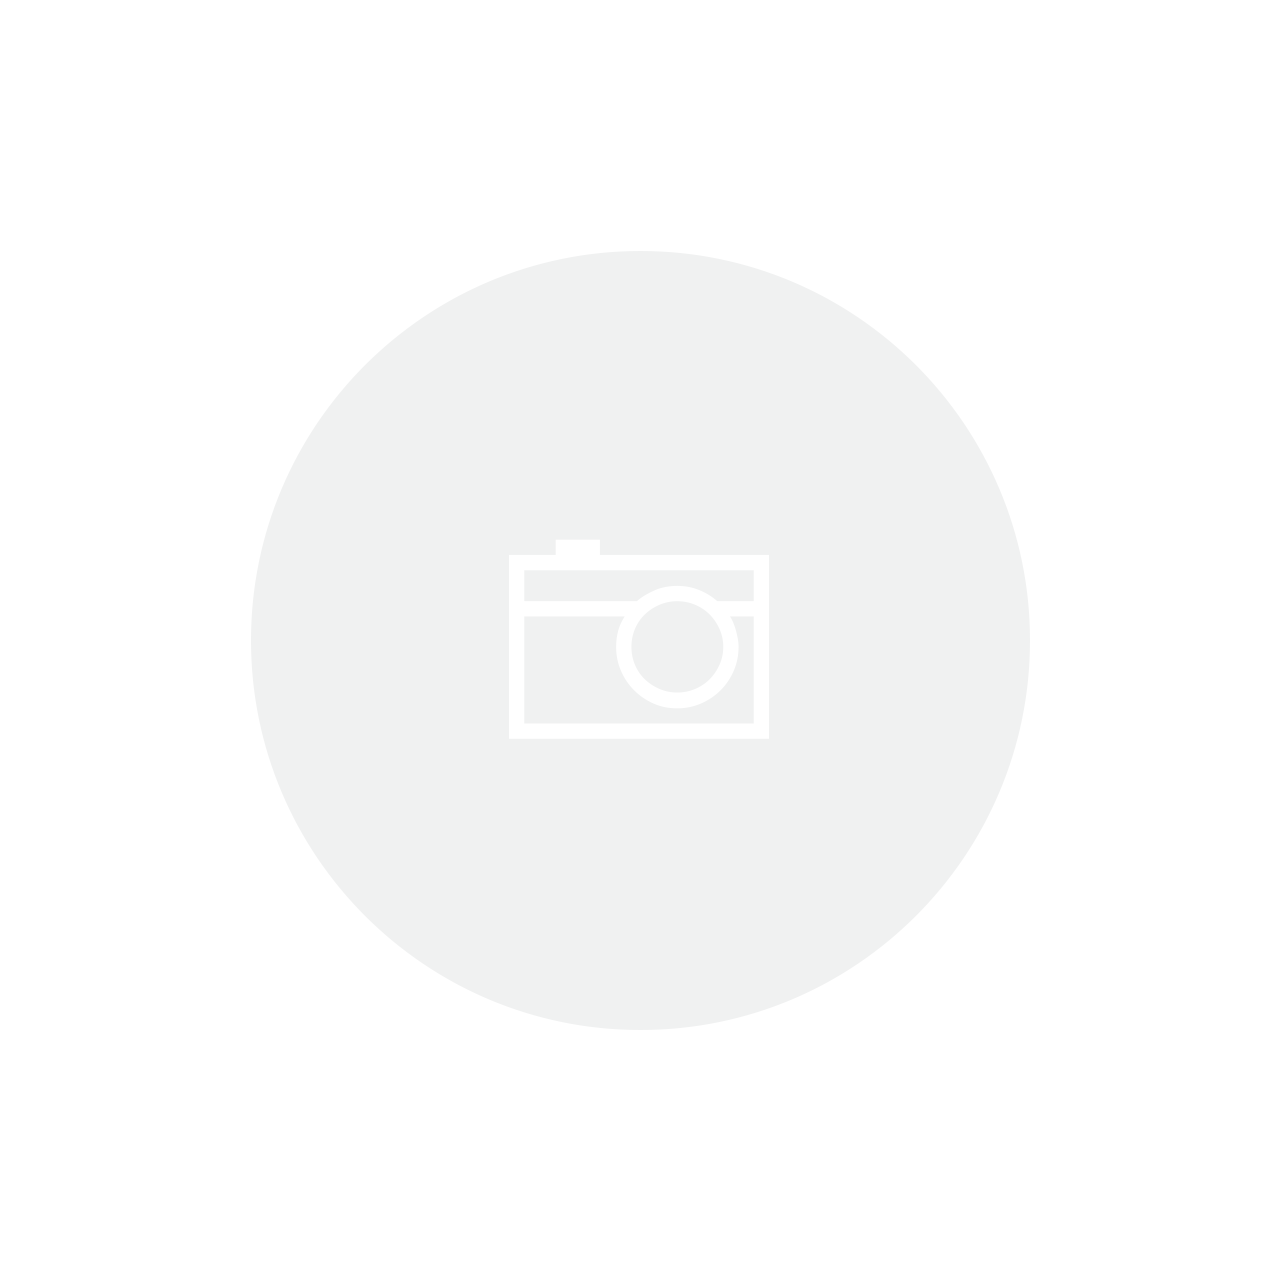 Papel Textura Color Plus 180g - Ref. 07 Porto Seguro